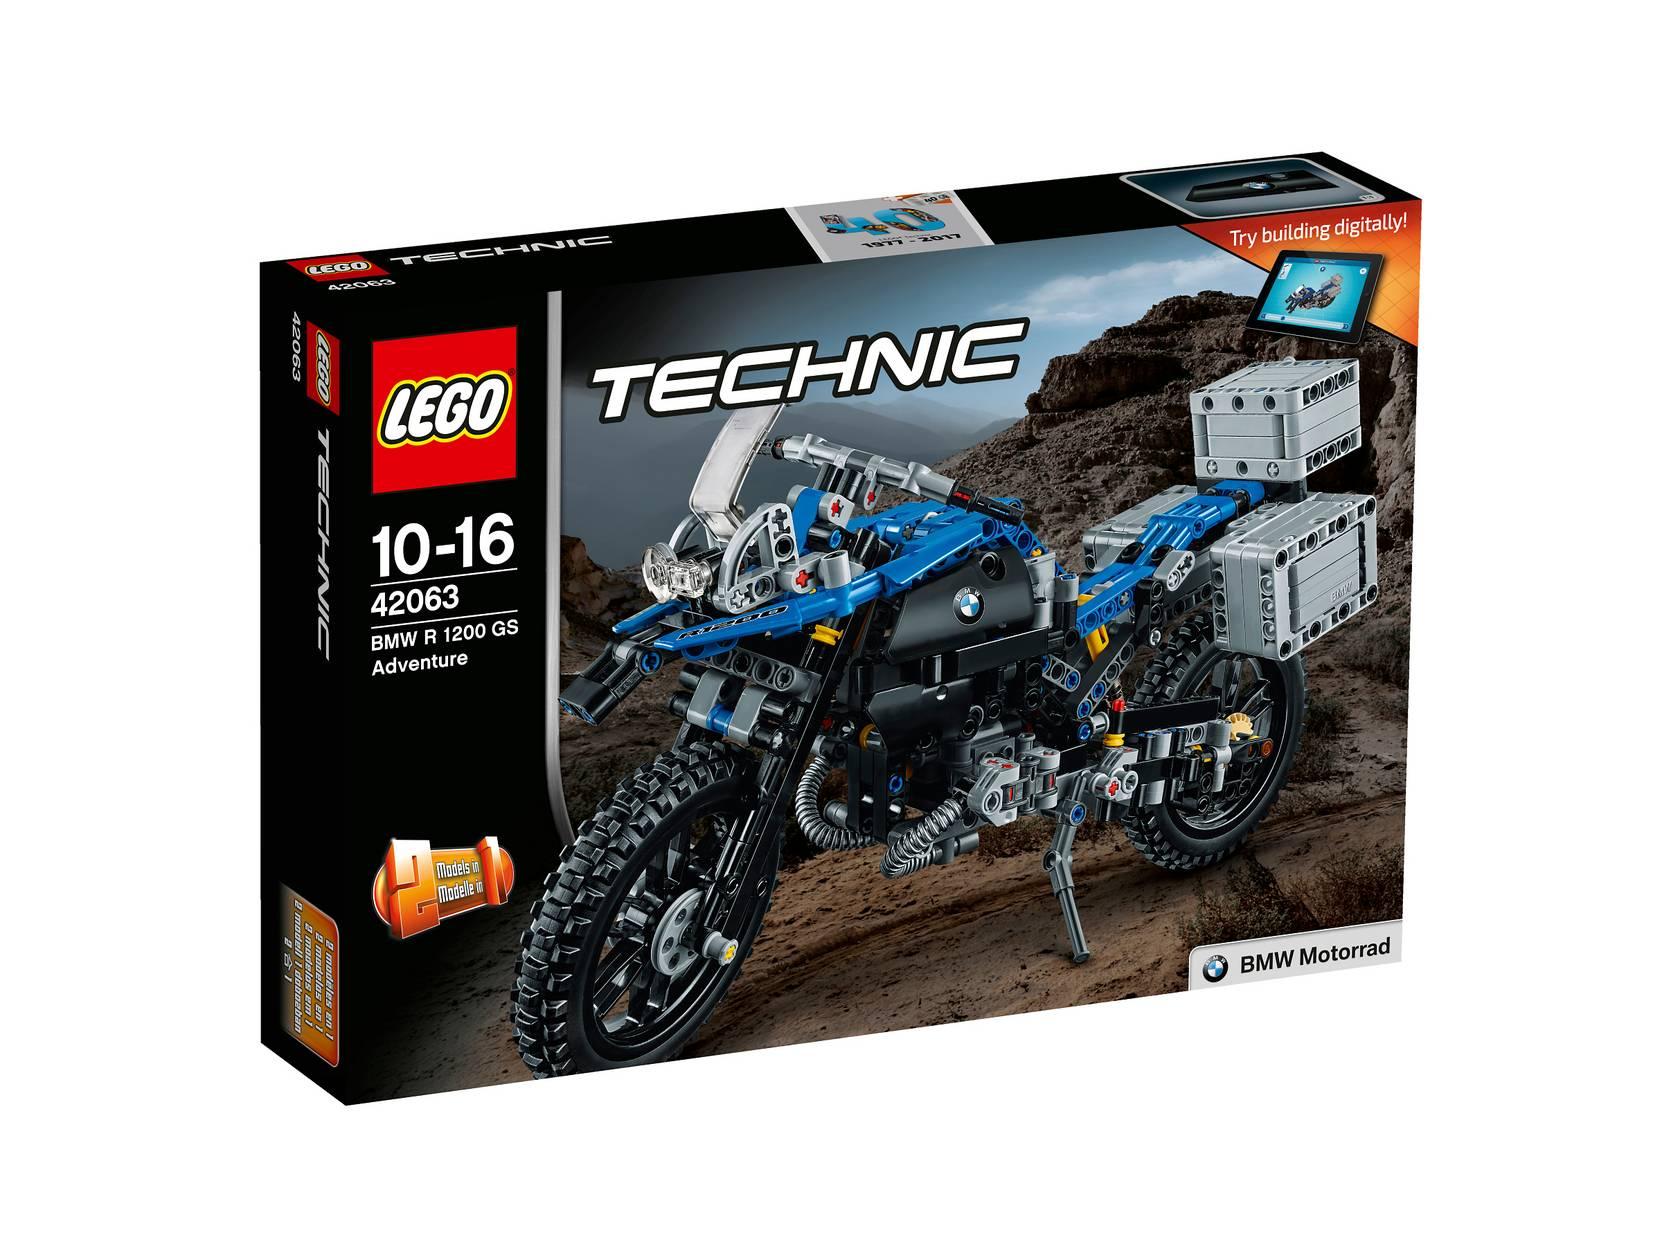 BMW R 1200 GS Adventure 42063 LEGO Lego til Børn i 42063